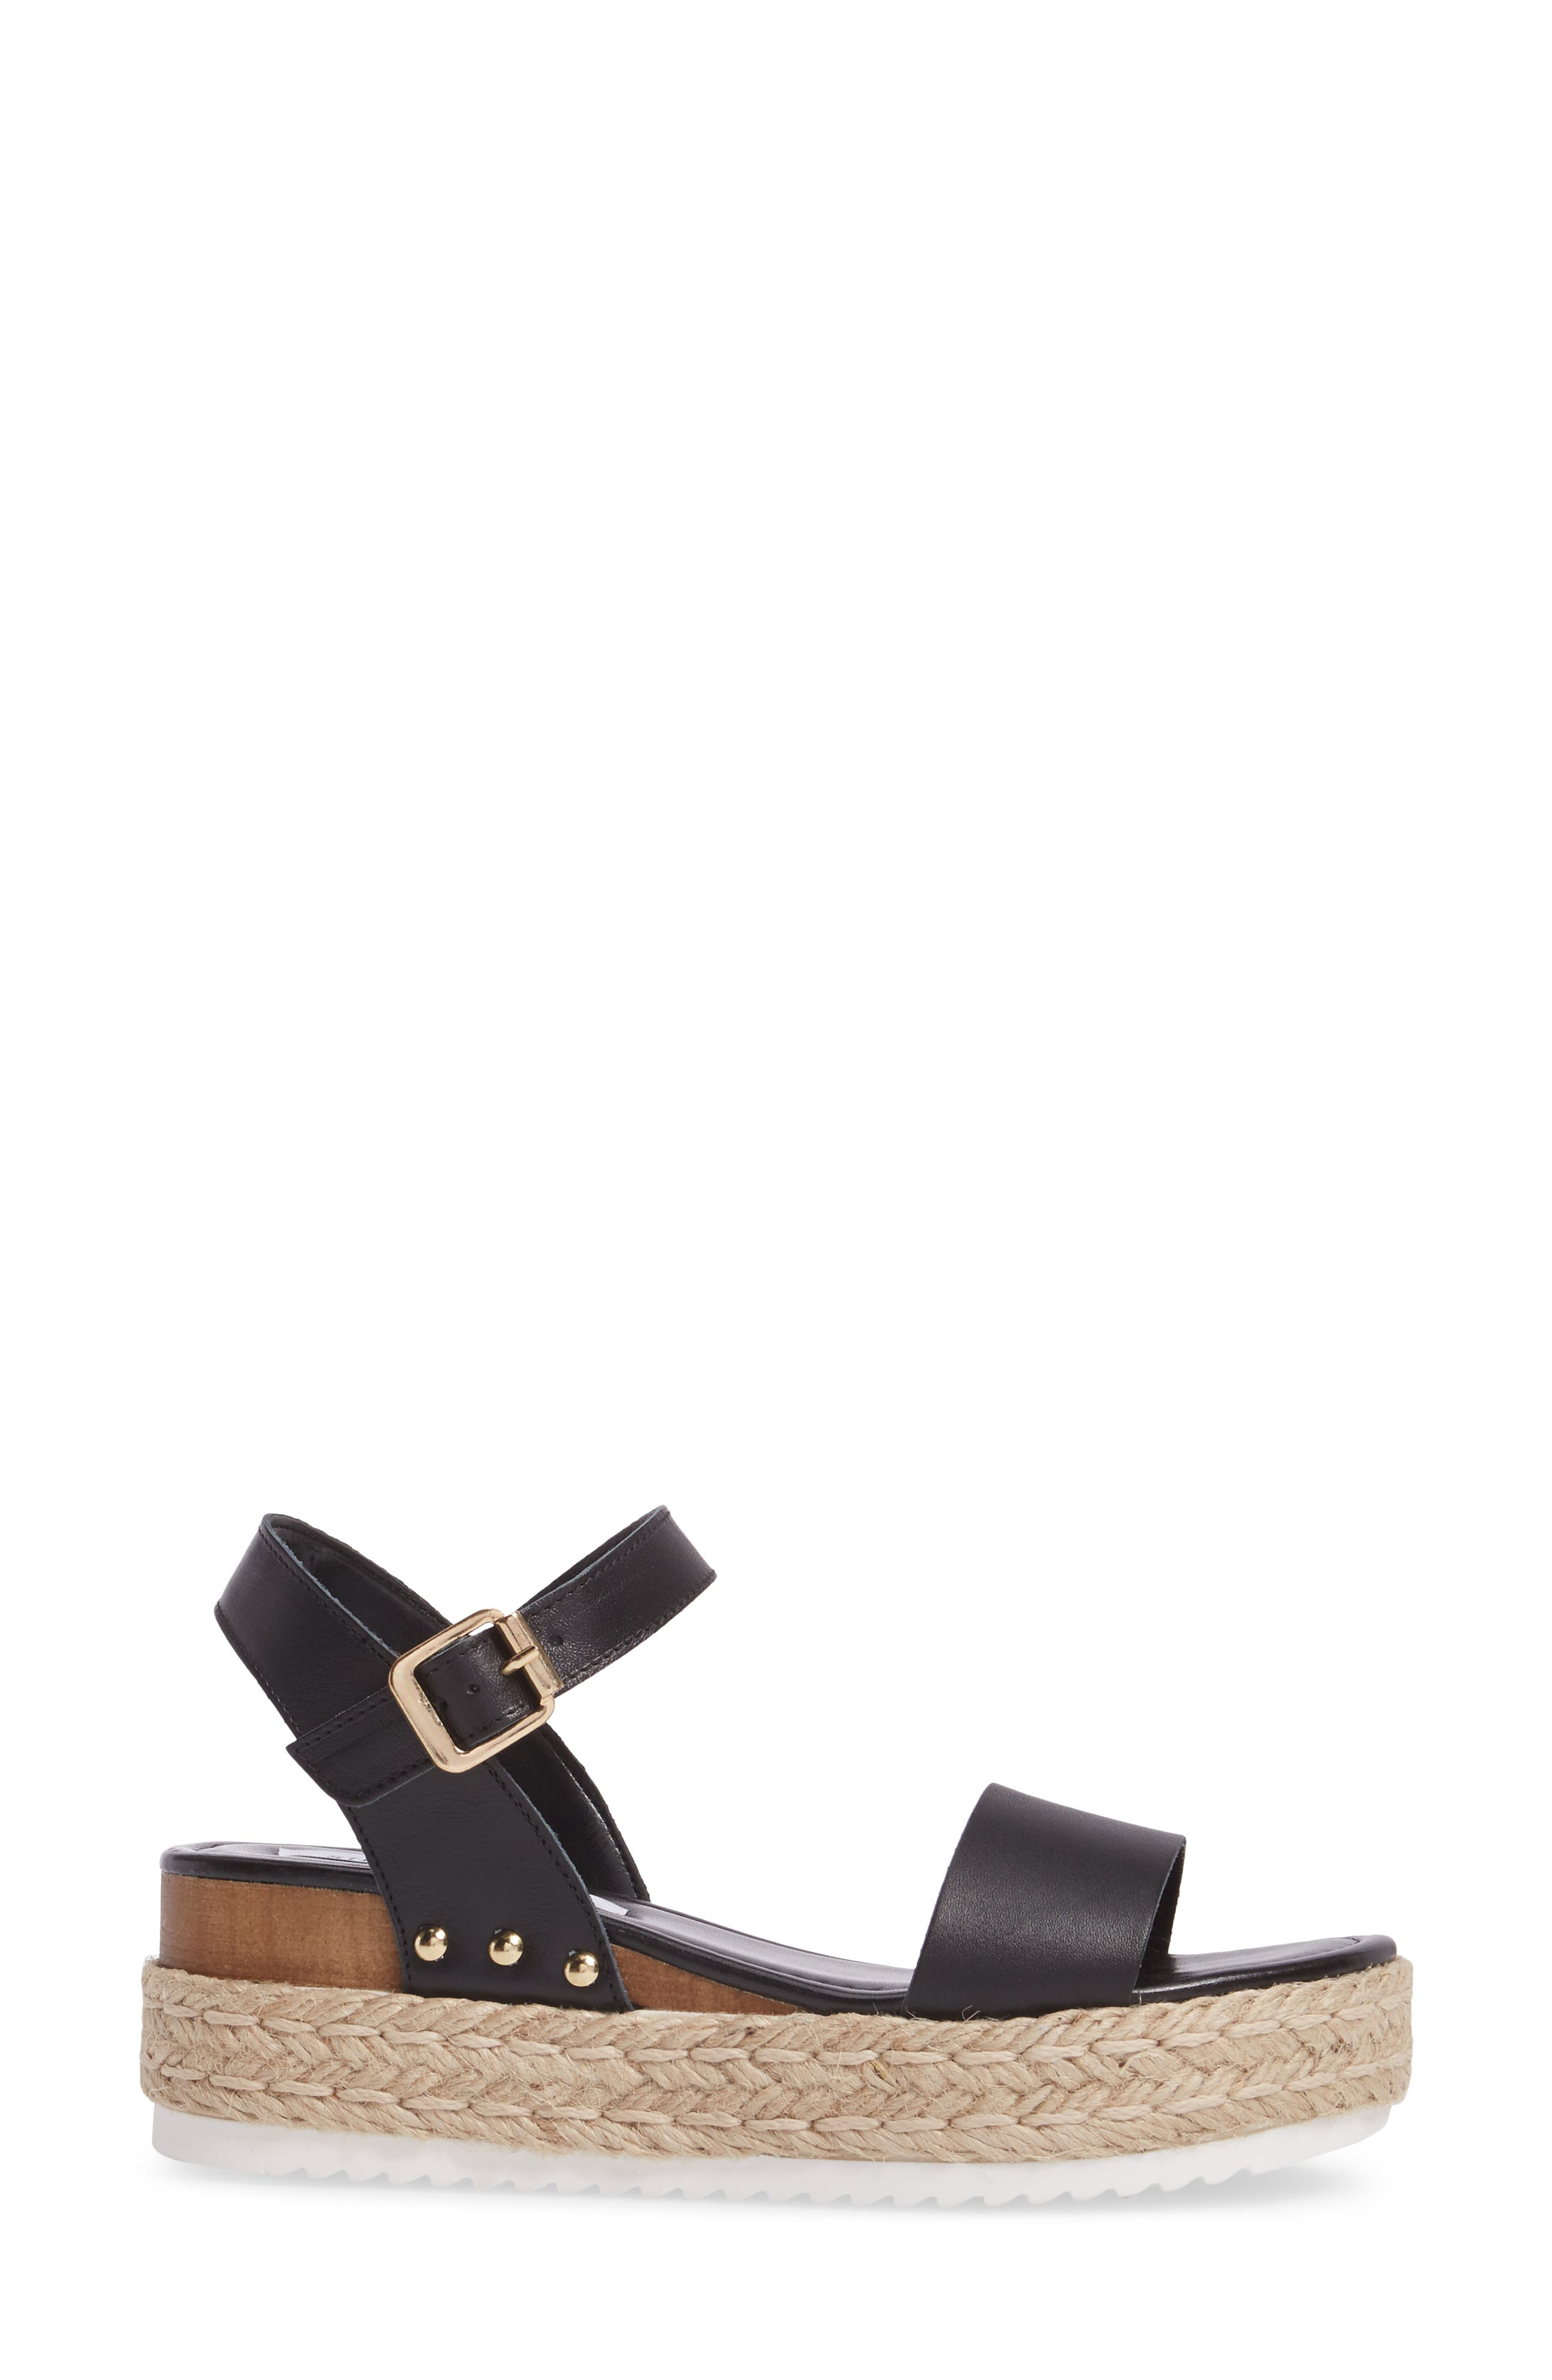 Chiara Platform Espadrille Sandal,                             Alternate thumbnail 3, color,                             Black Leather